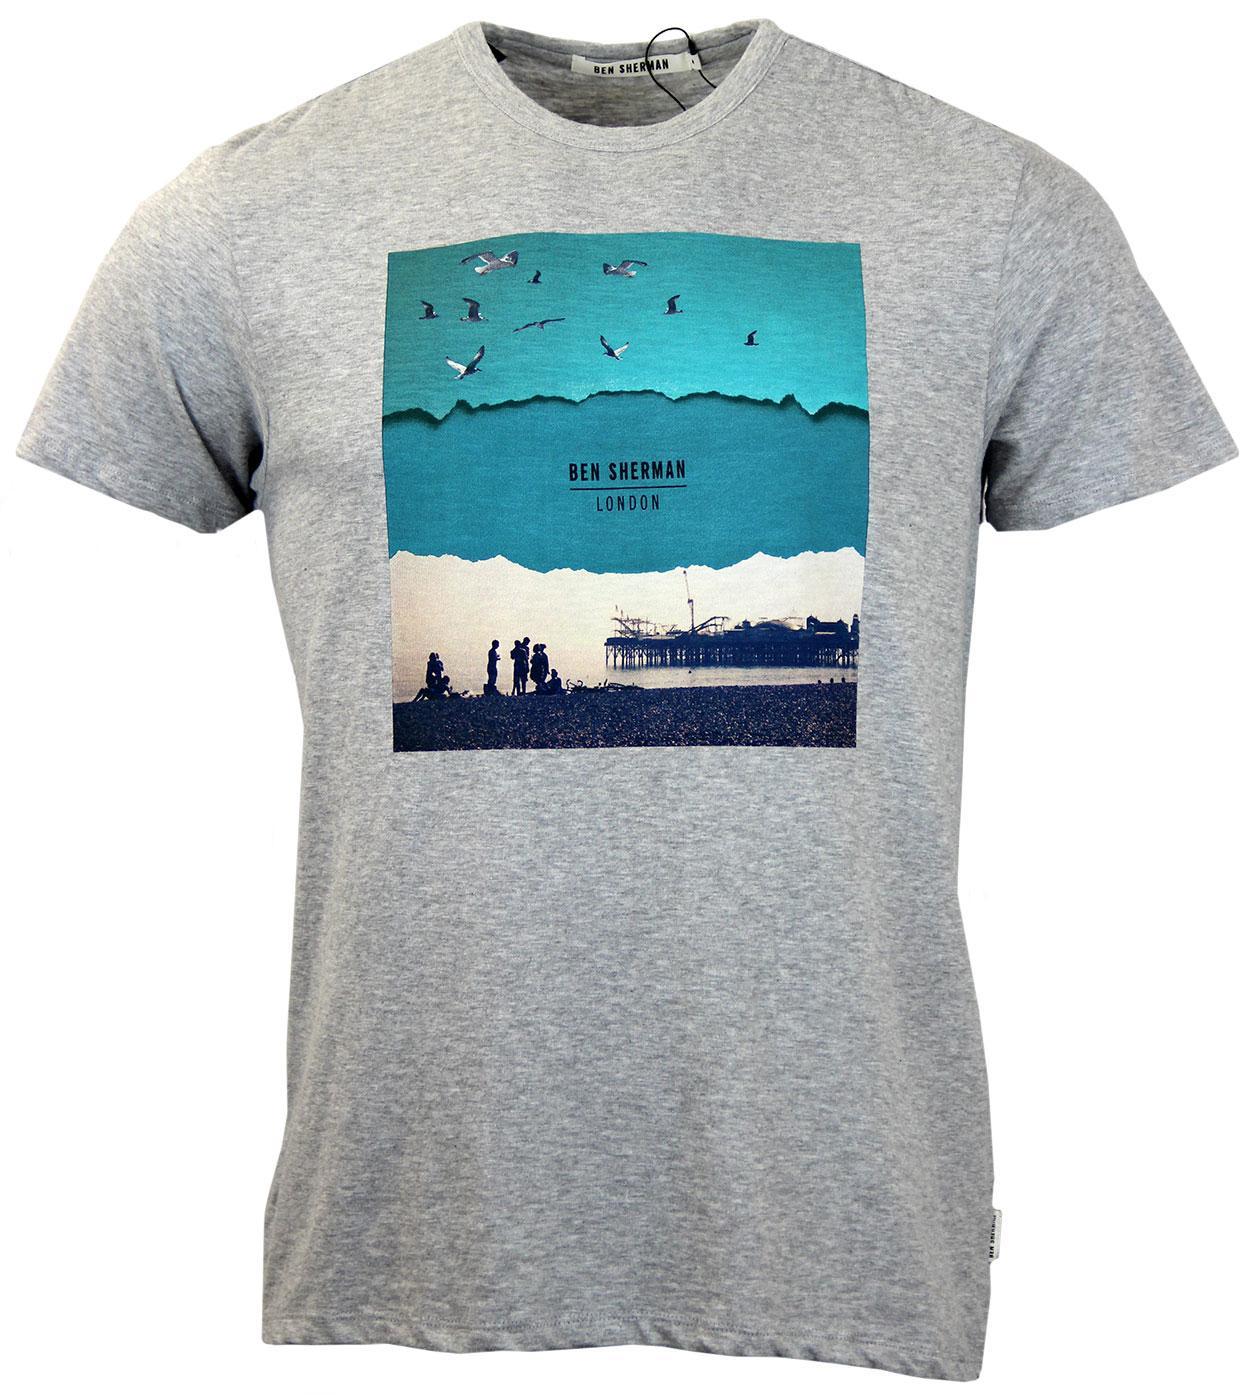 ben sherman brighton beach retro mod graphic print t shirt